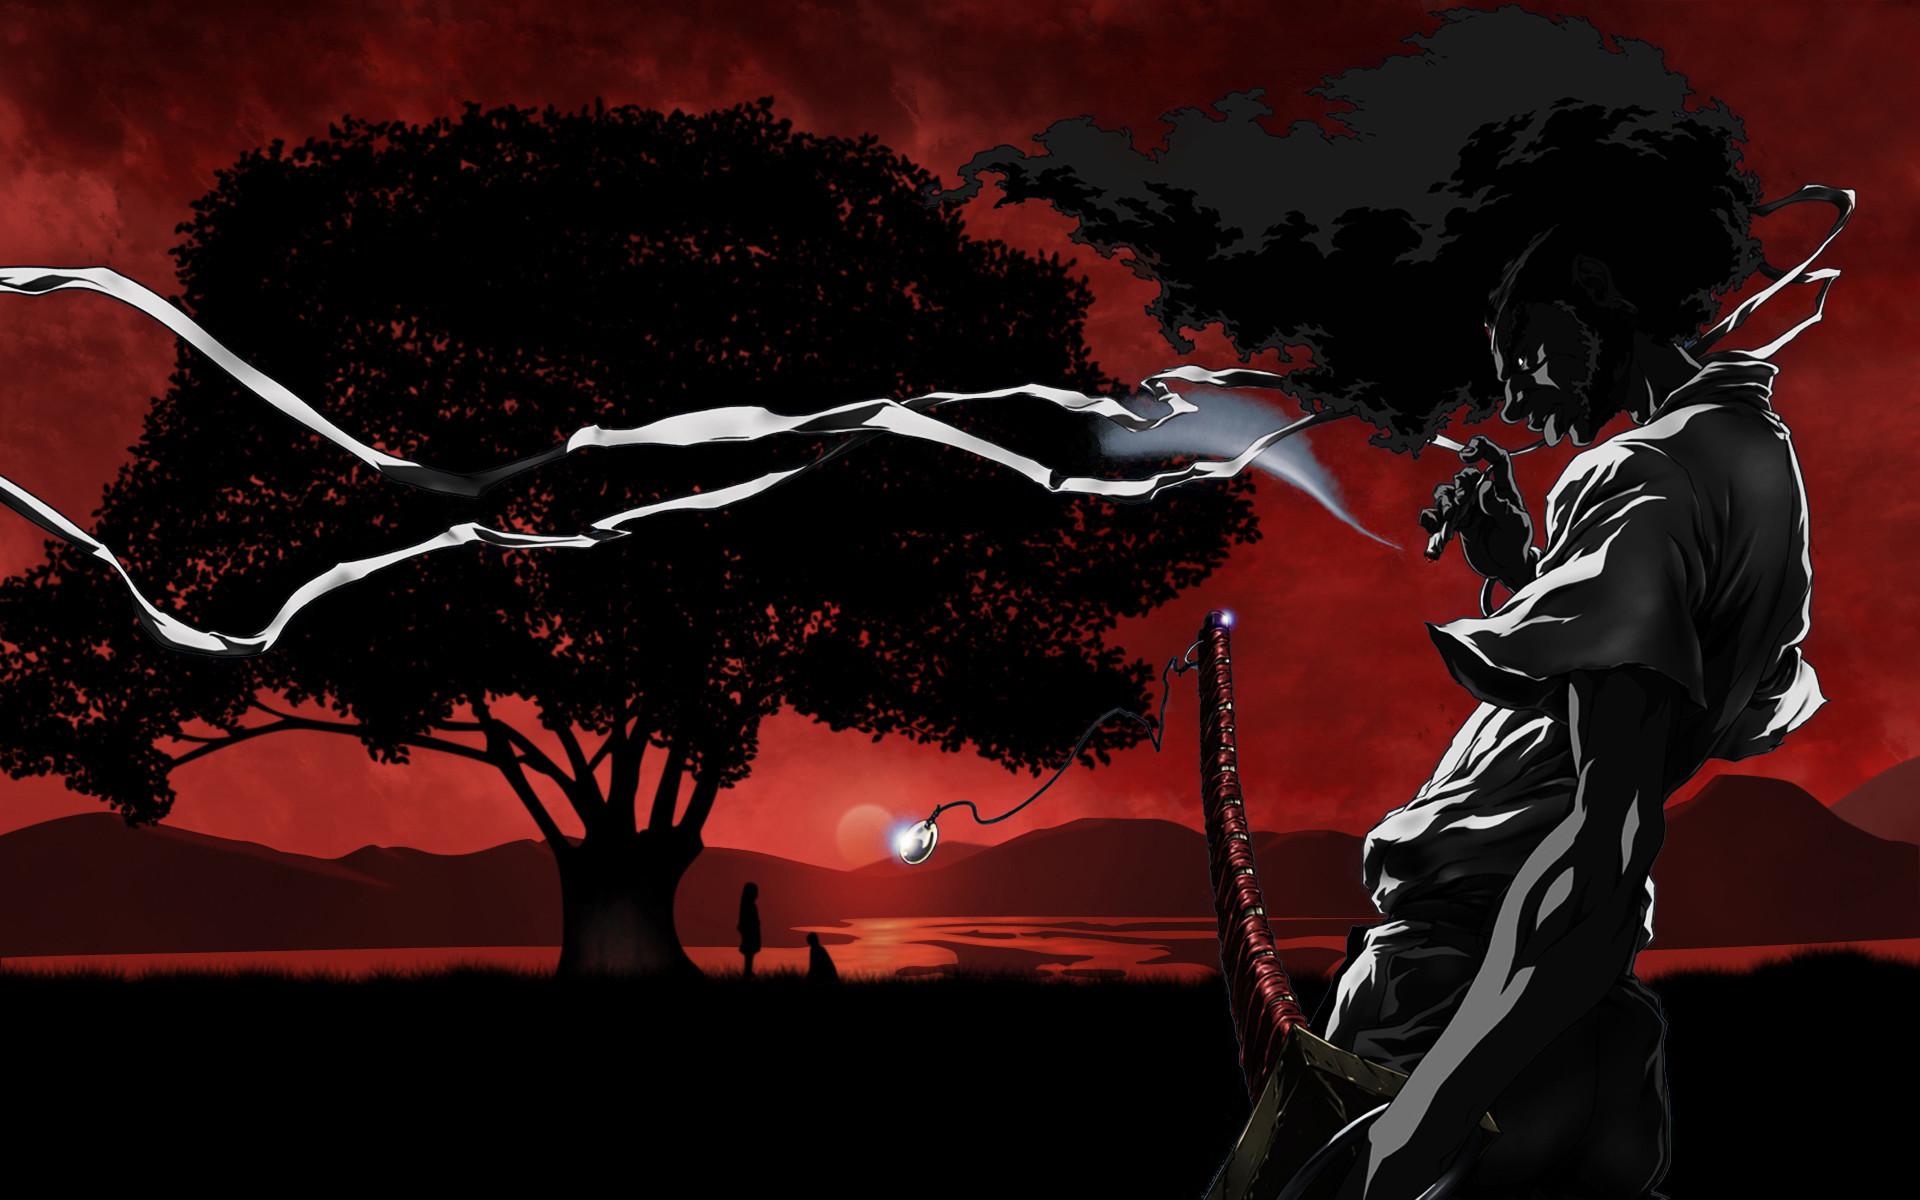 Afro Samurai Tattoo Design Hd Wallpaper   Cartoon Wallpapers   Pinterest    Samurai tattoo, Afro samurai and Samurai